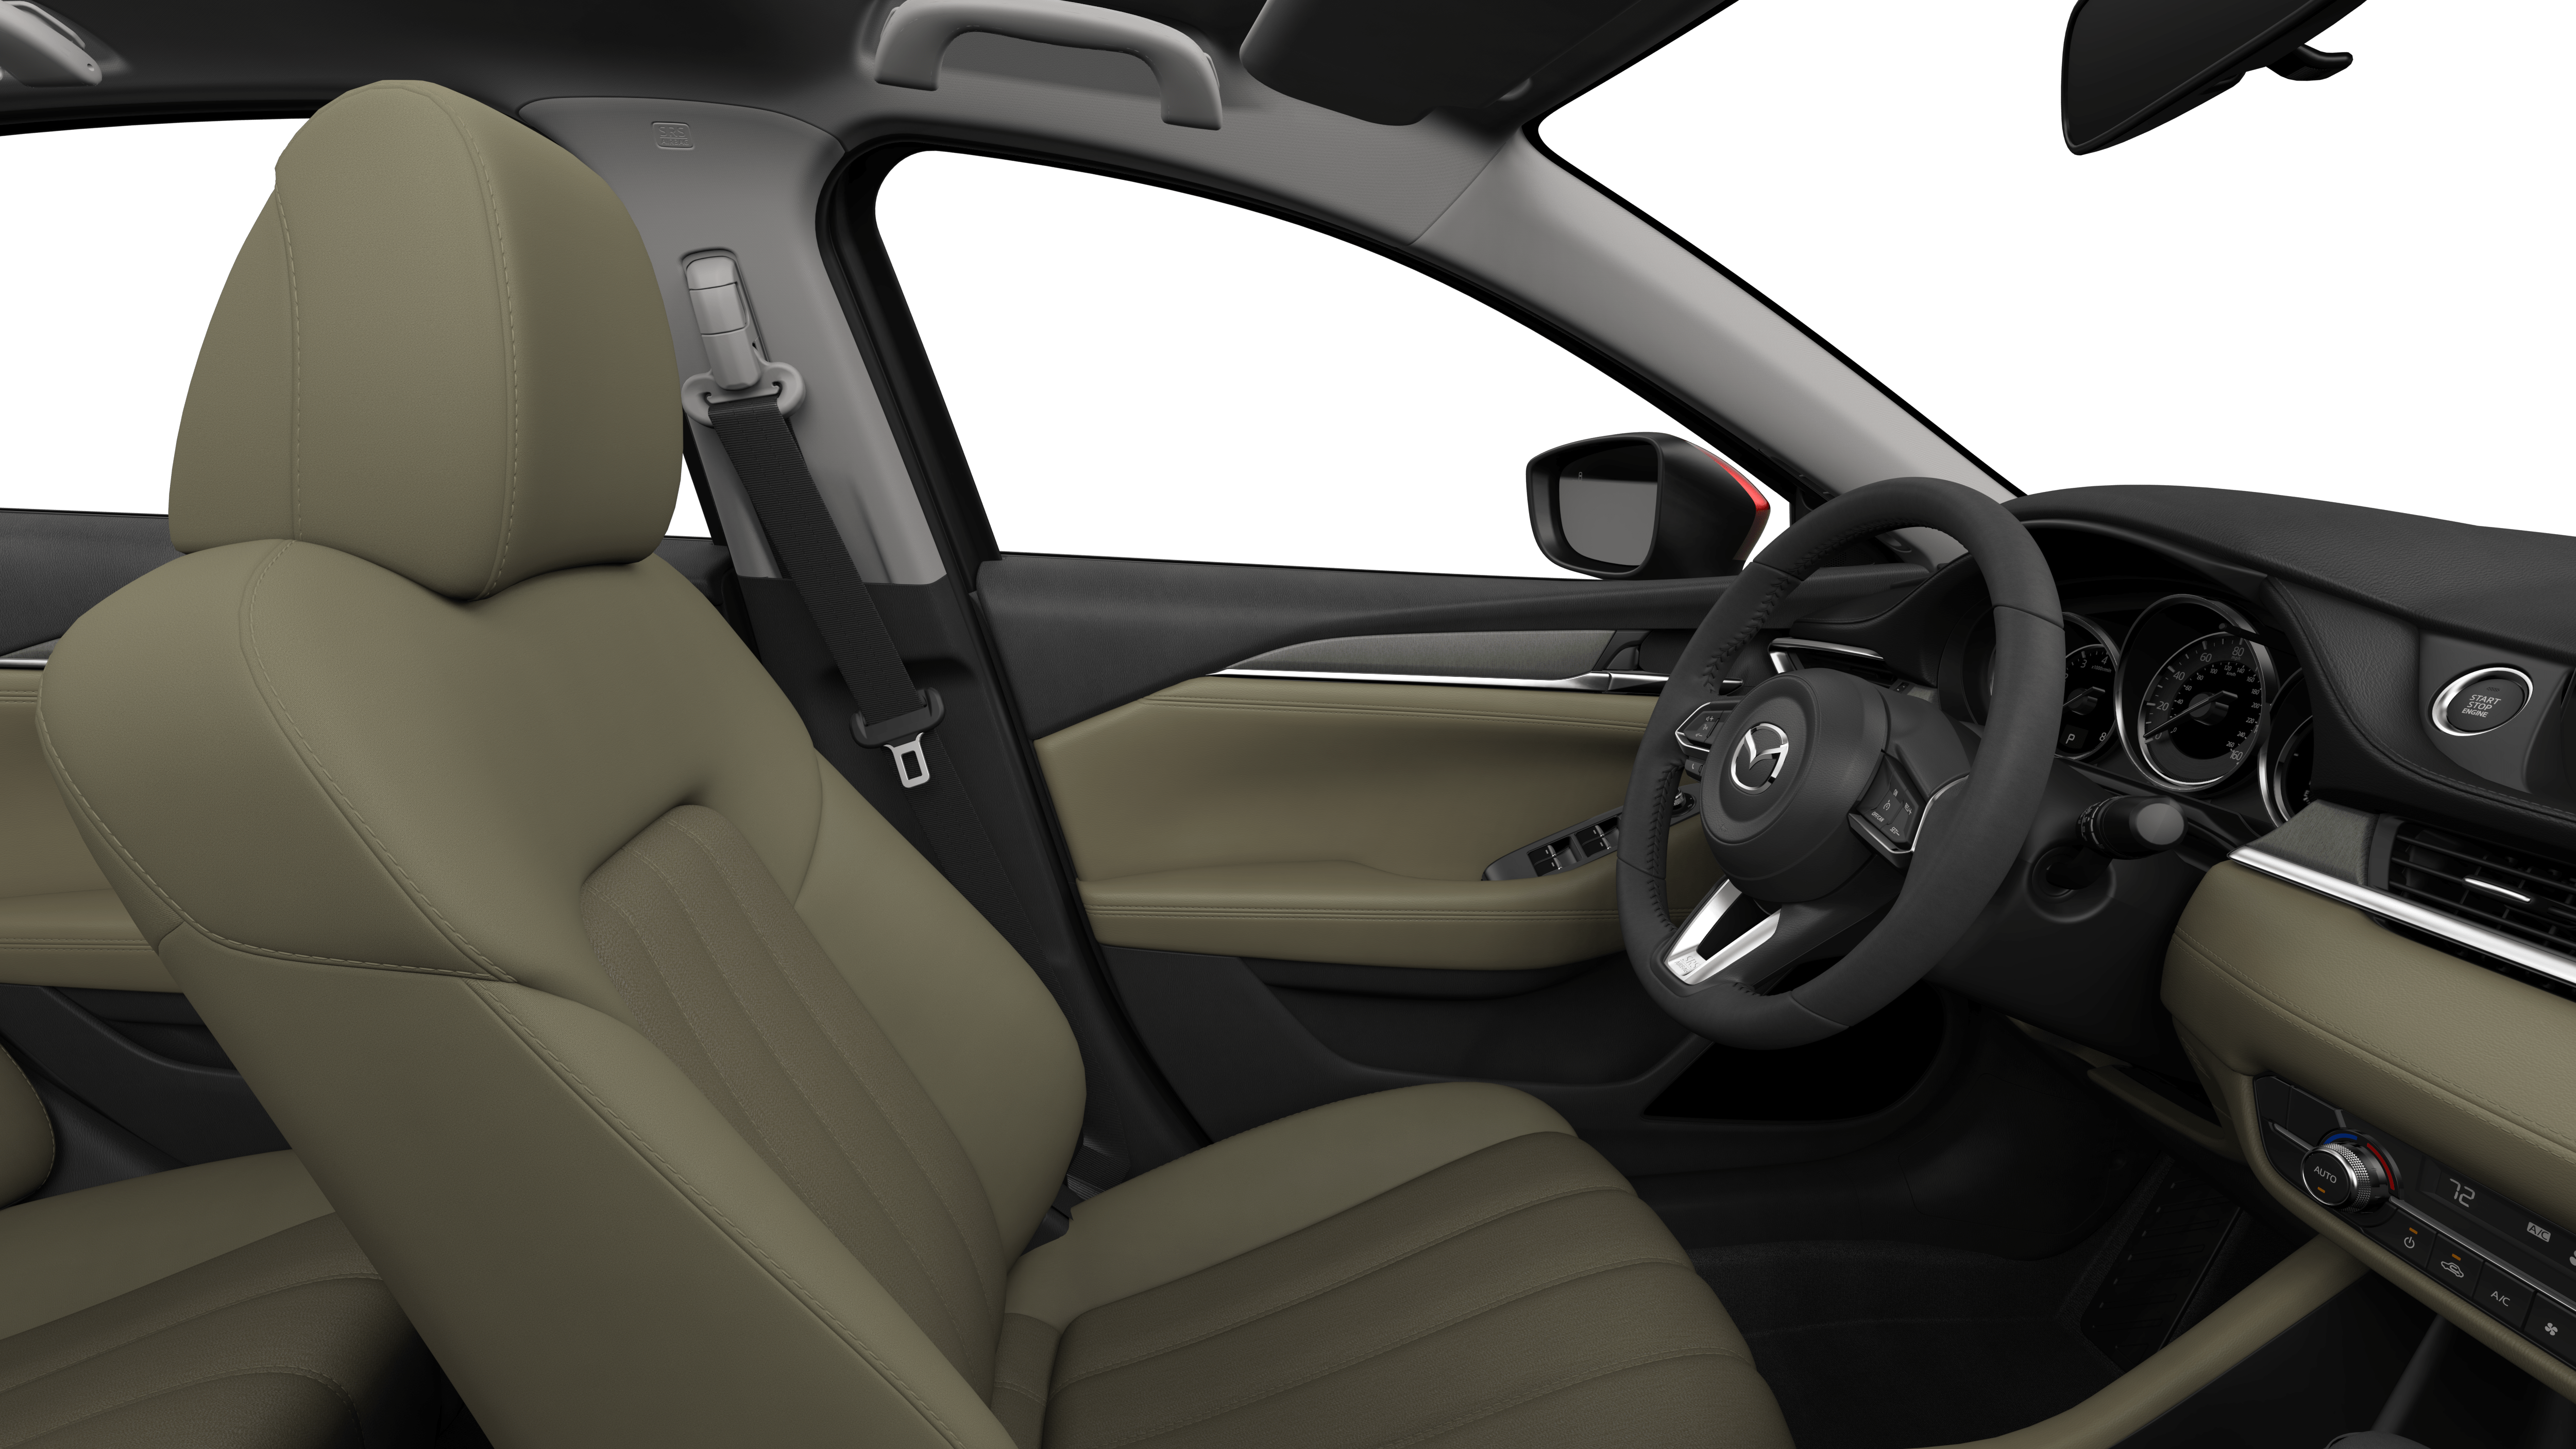 Mazda Cx 5 Sand Cloth Interior Psoriasisguru Com